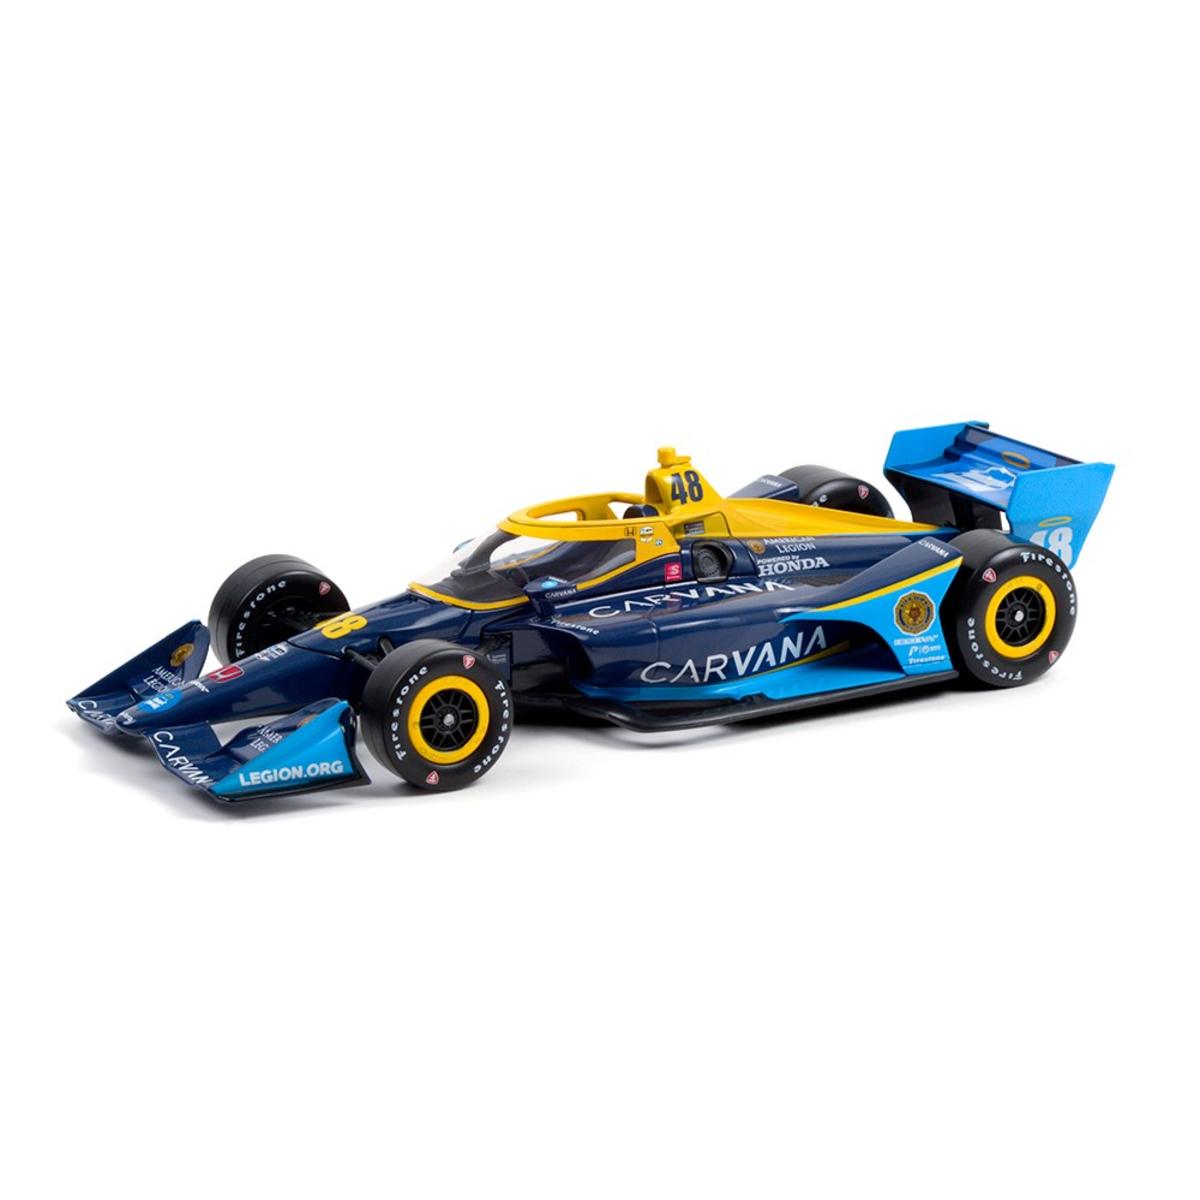 Autographed Jimmie Johnson IndyCar Series 2021 #48 1:18 Diecast